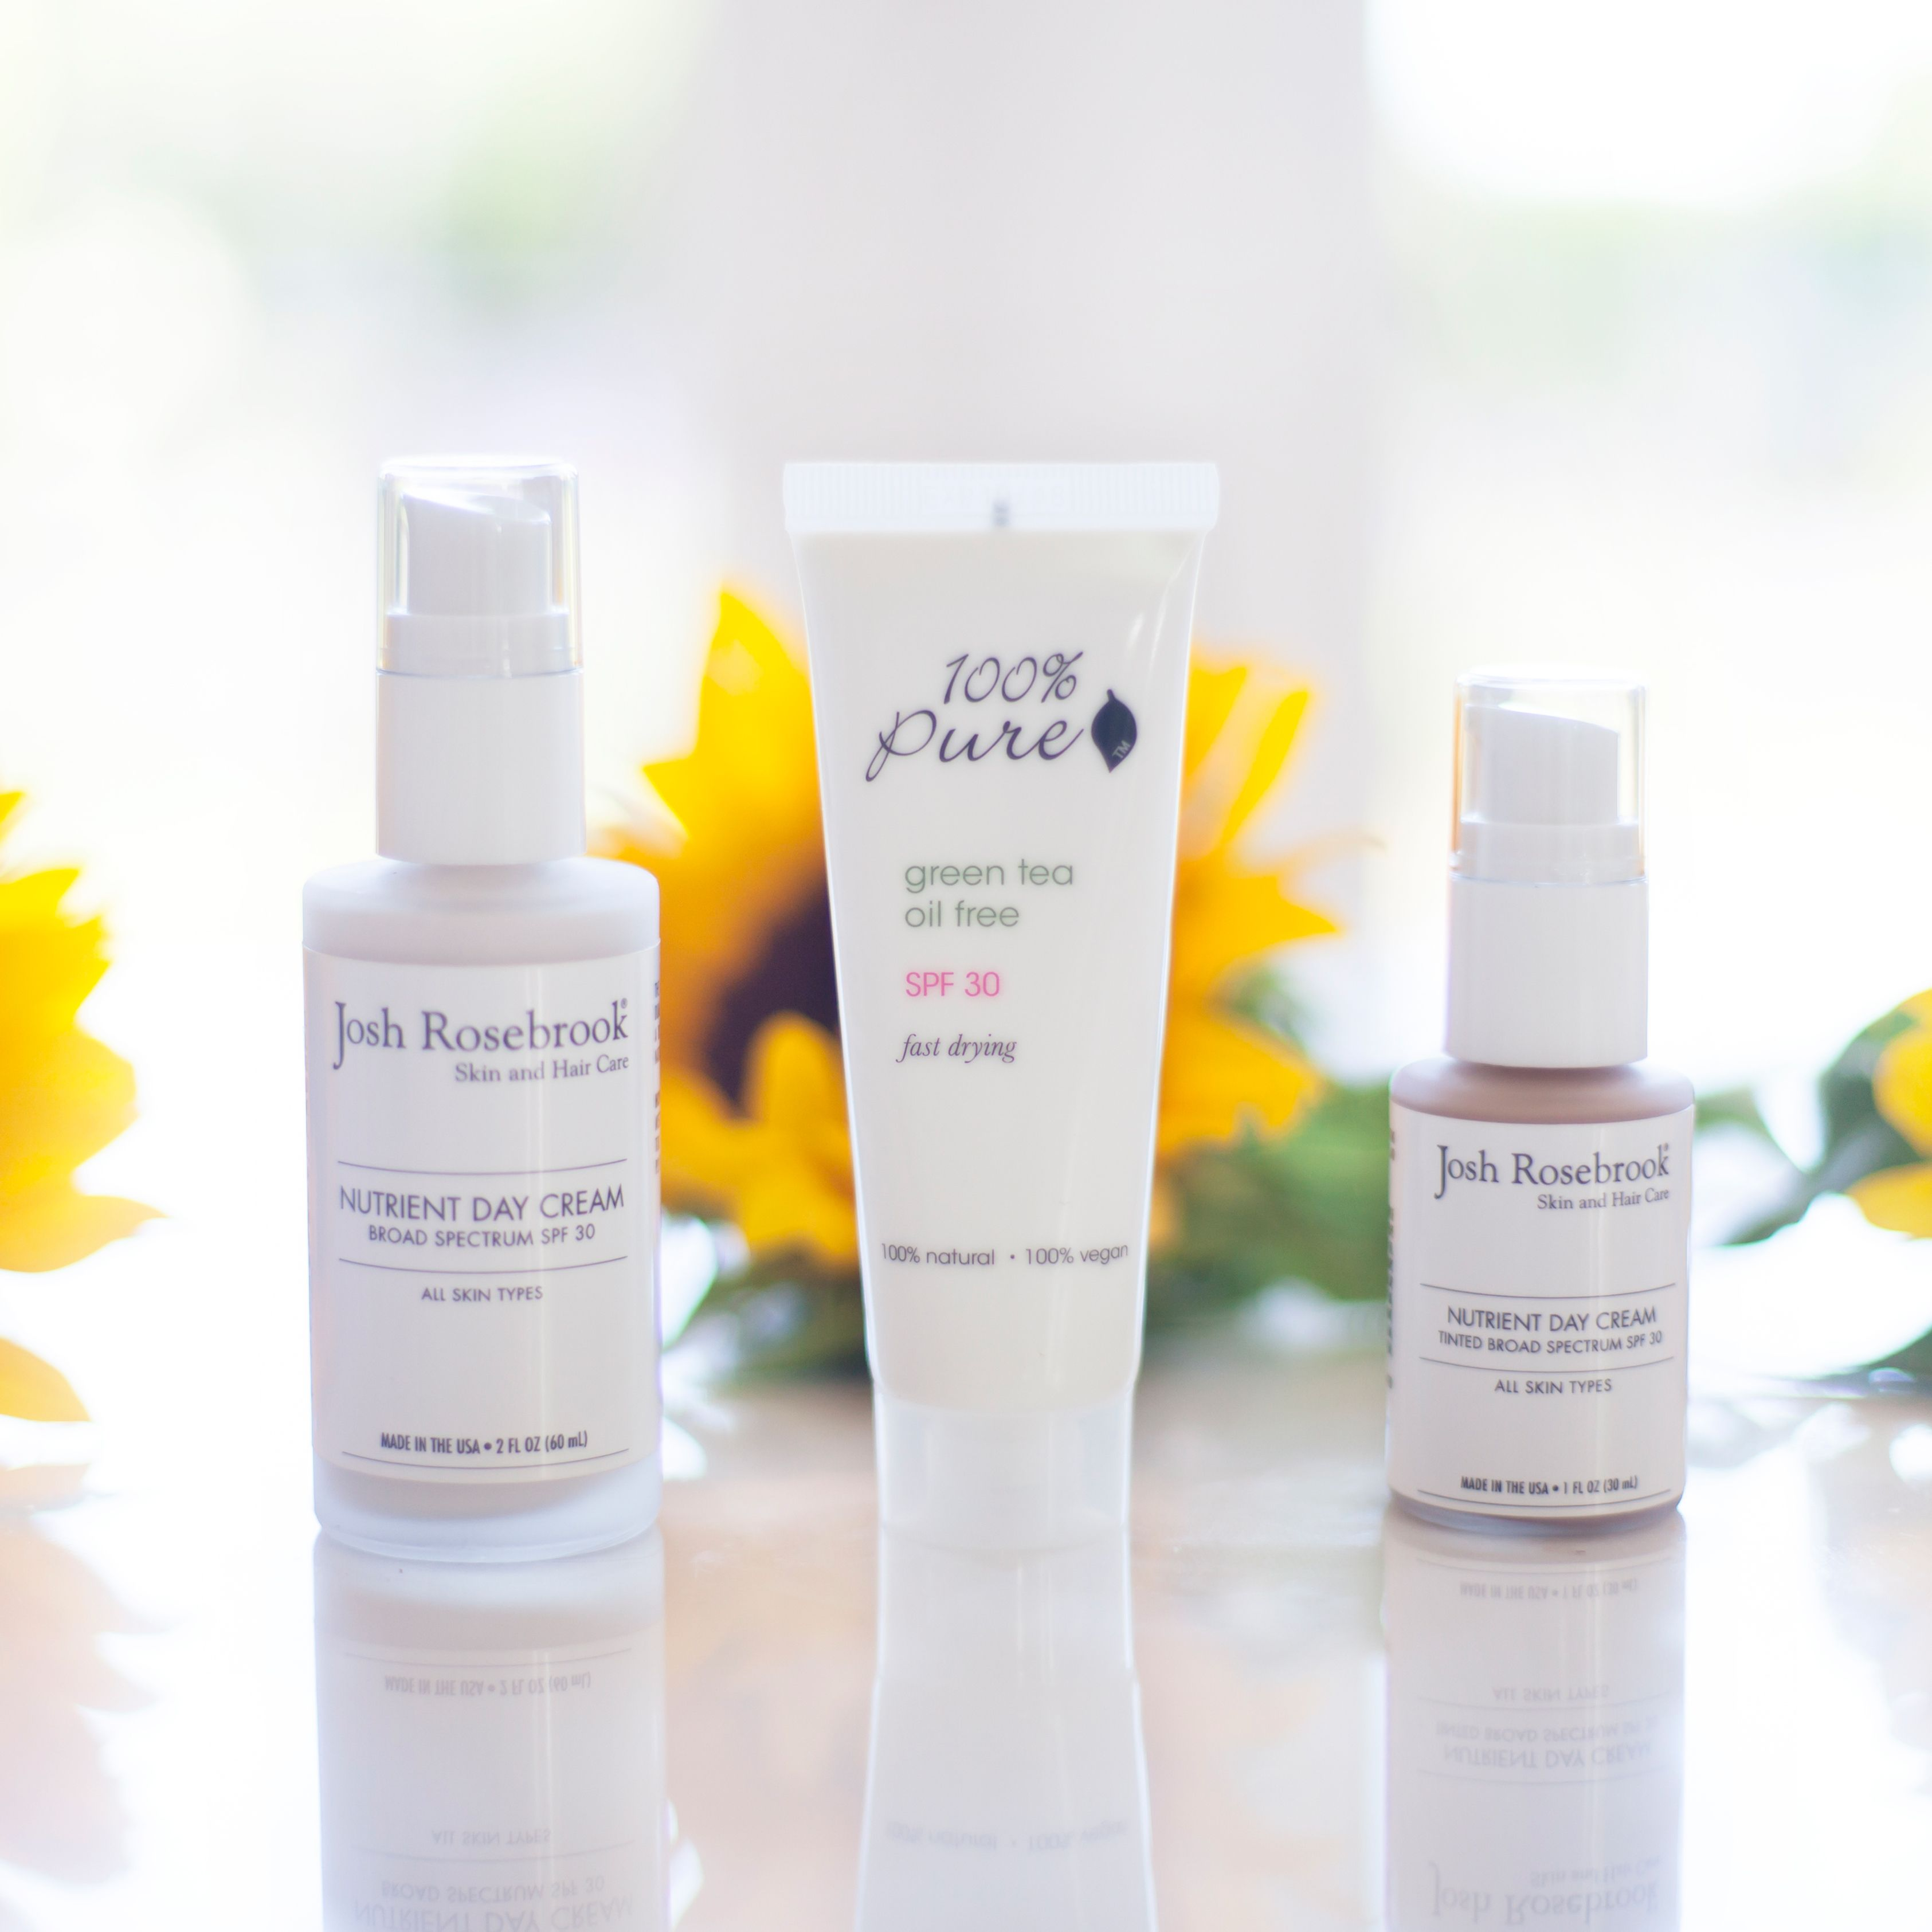 Natural SPF skincare greenbeauty naturalskincare